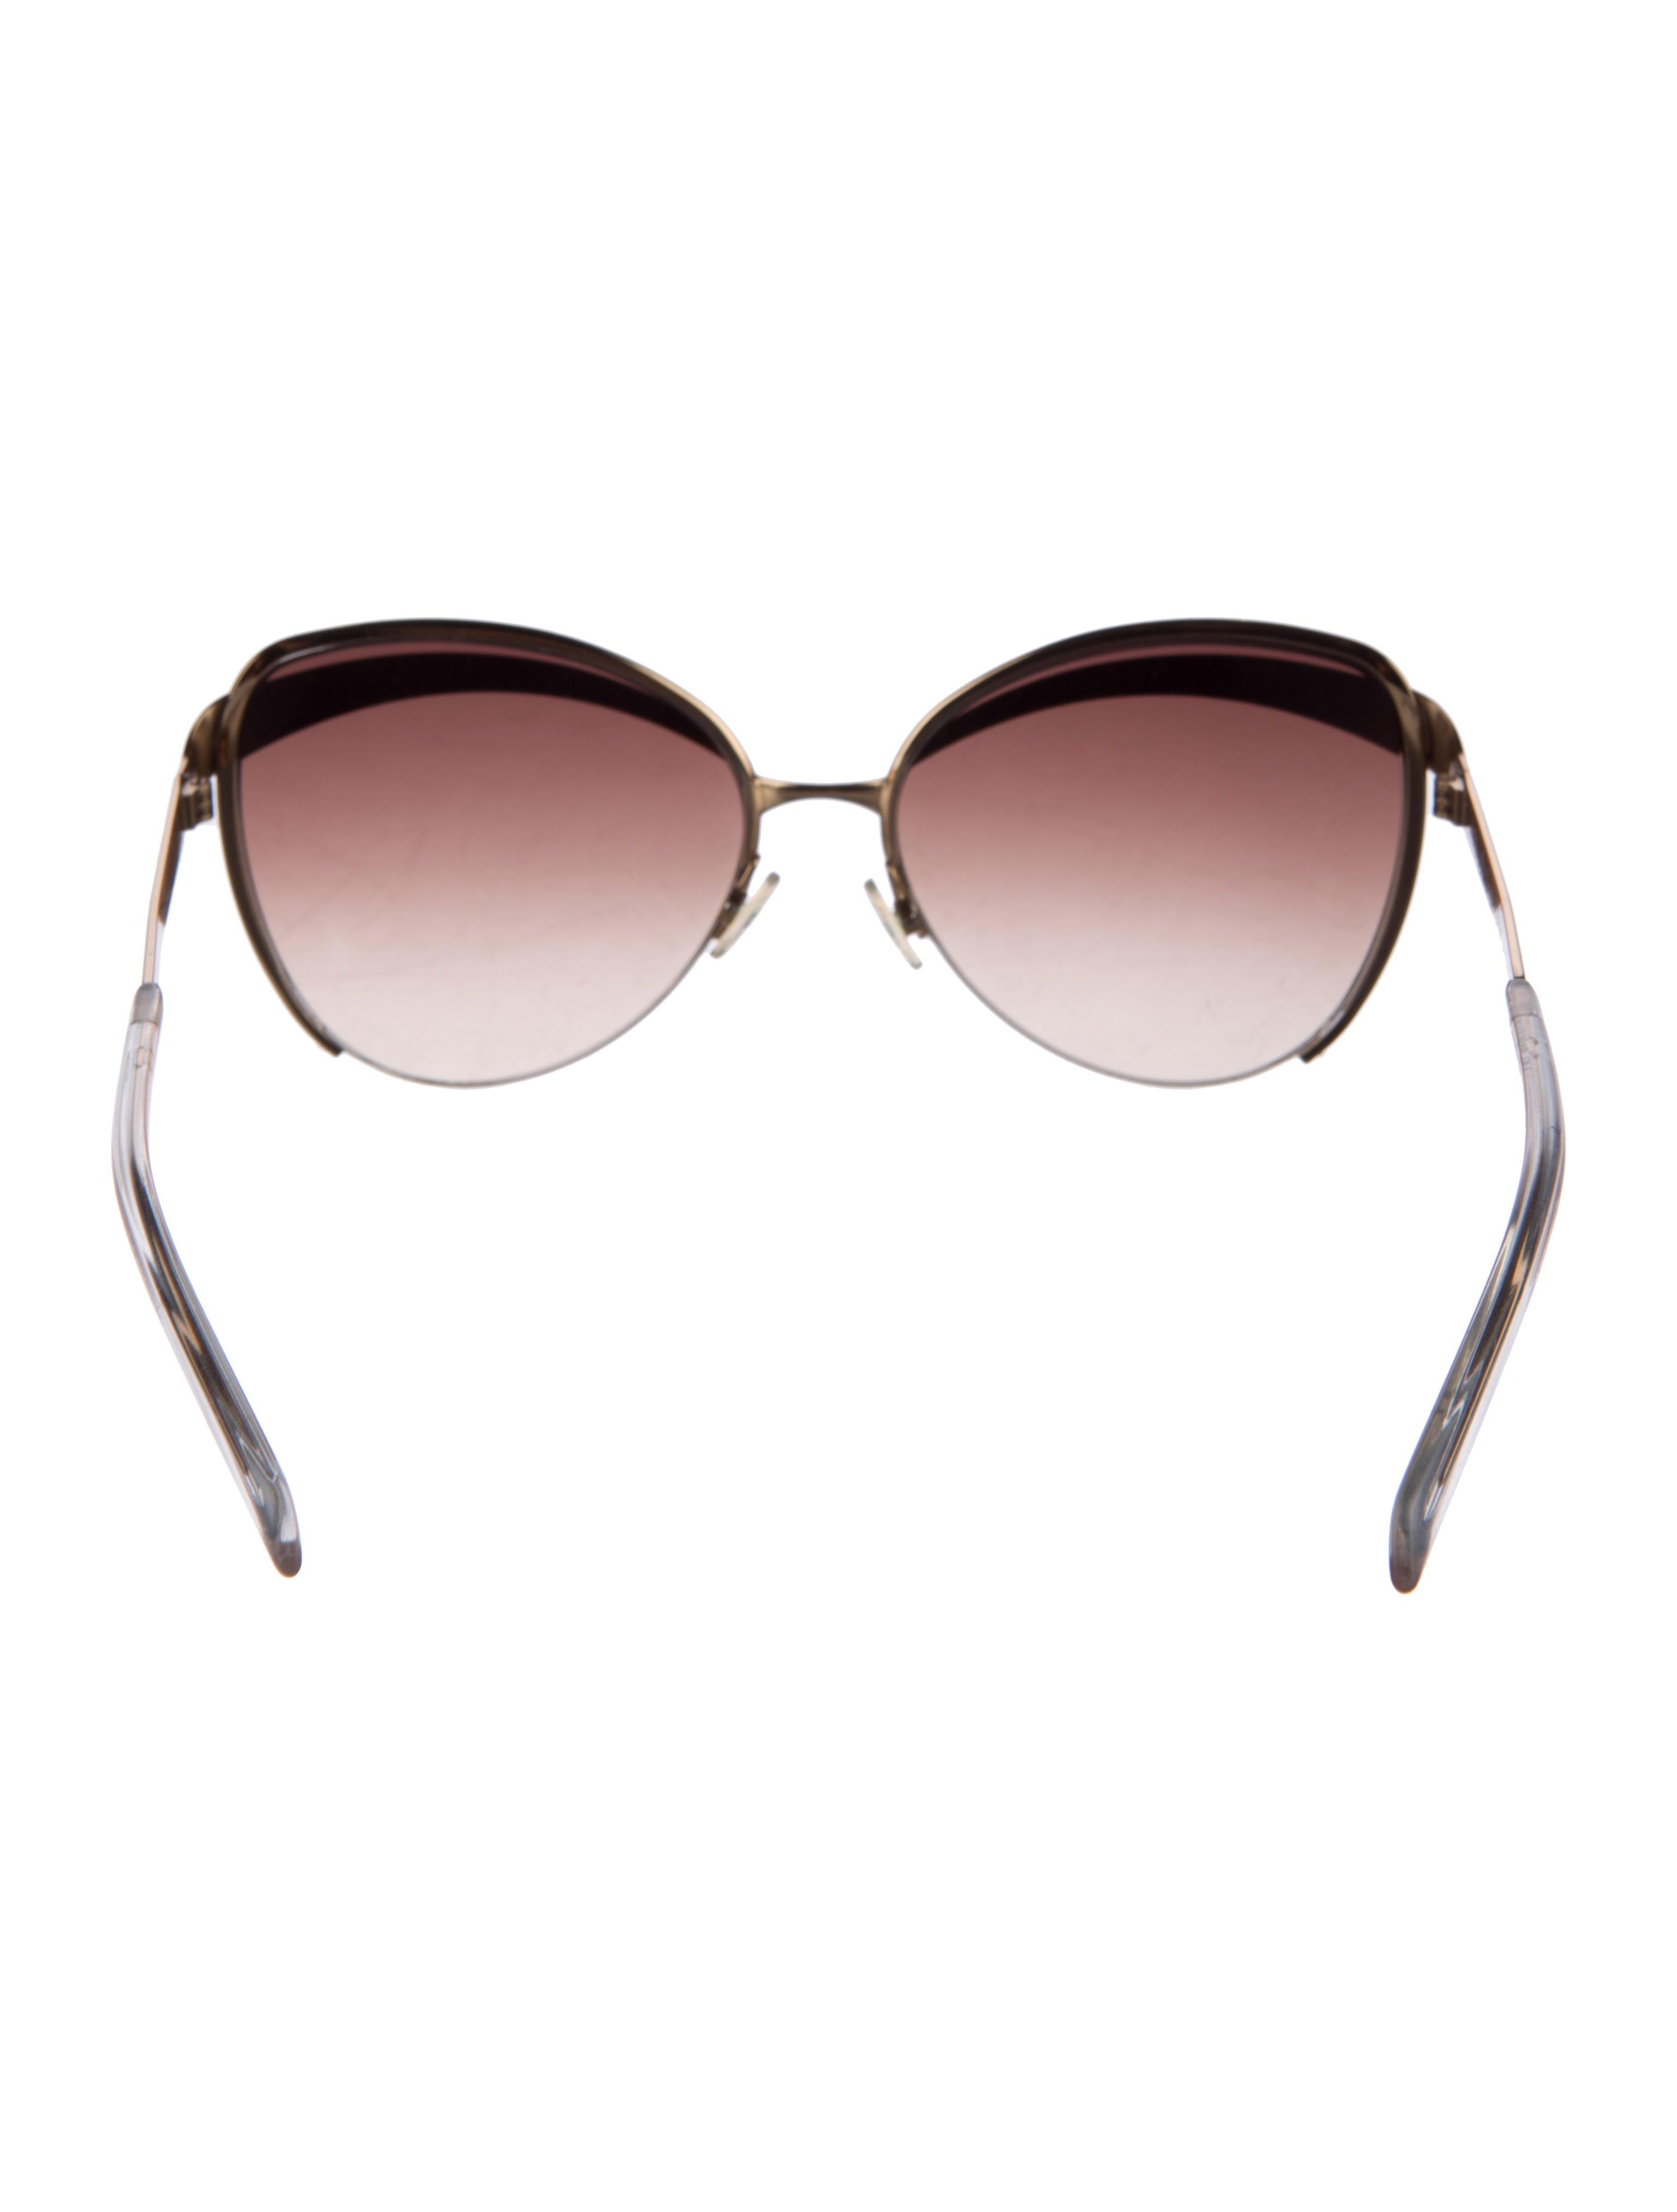 263d0d7f77f17 Christian Dior Eyes 1 Cat-Eye Sunglasses - Accessories - CHR53137